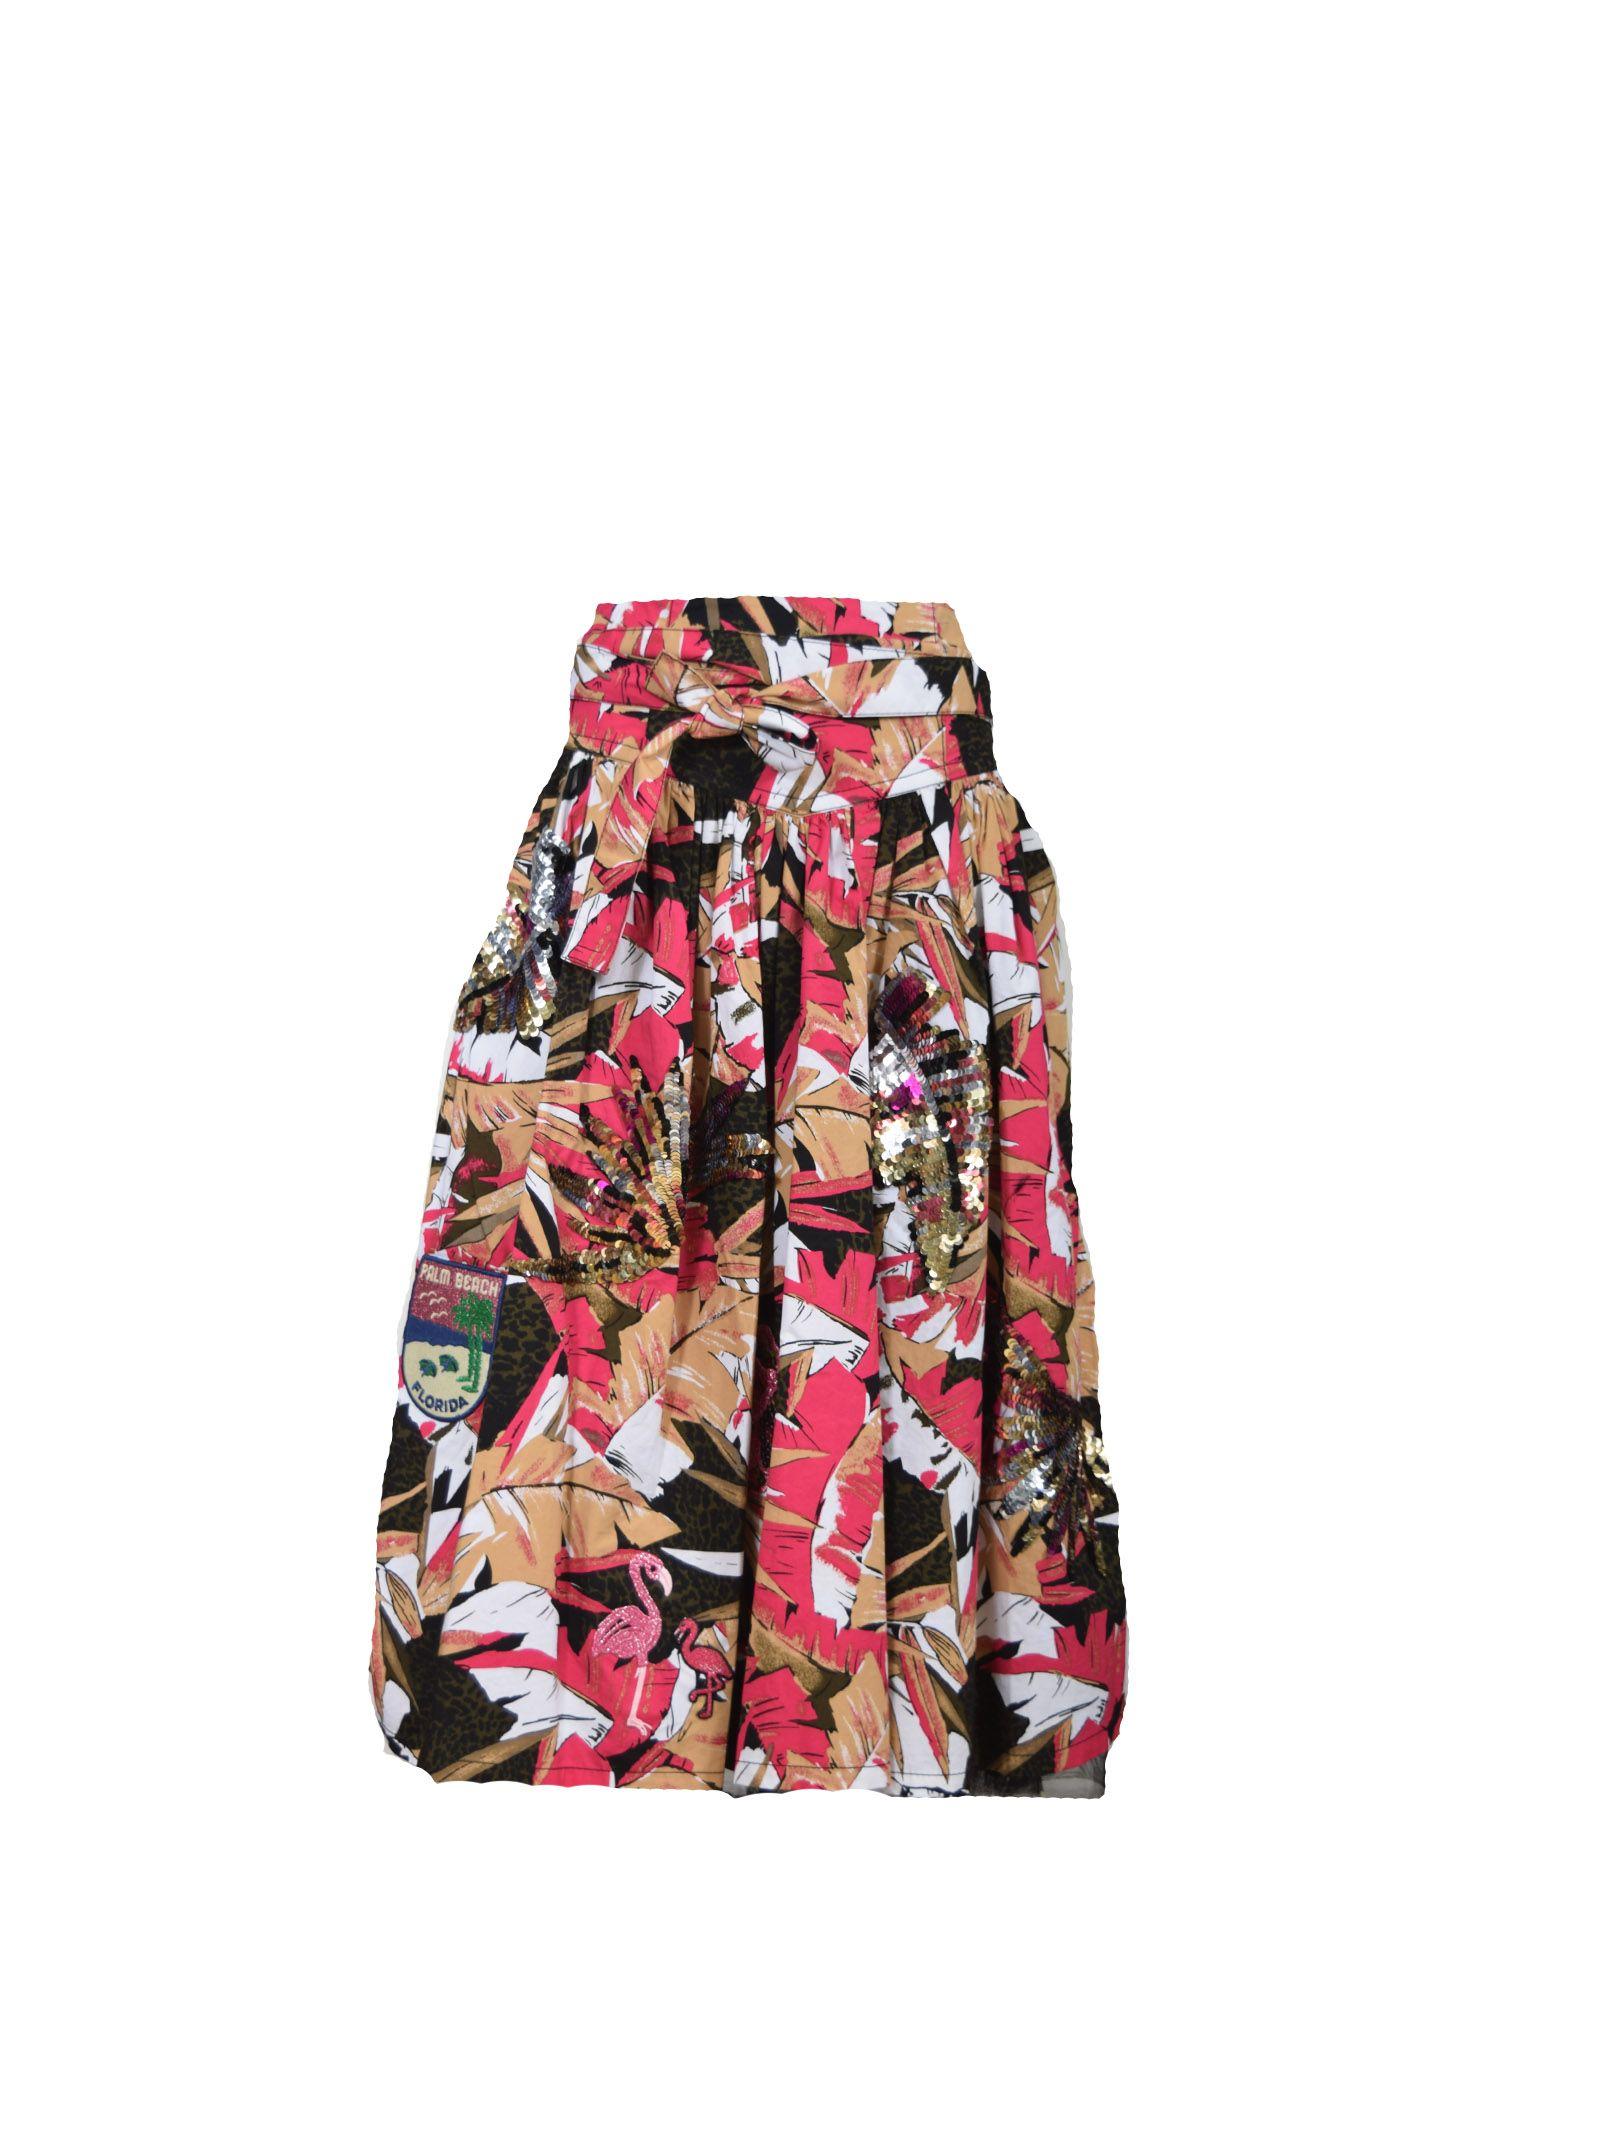 marc jacobs female marc jacobs floral print skirt